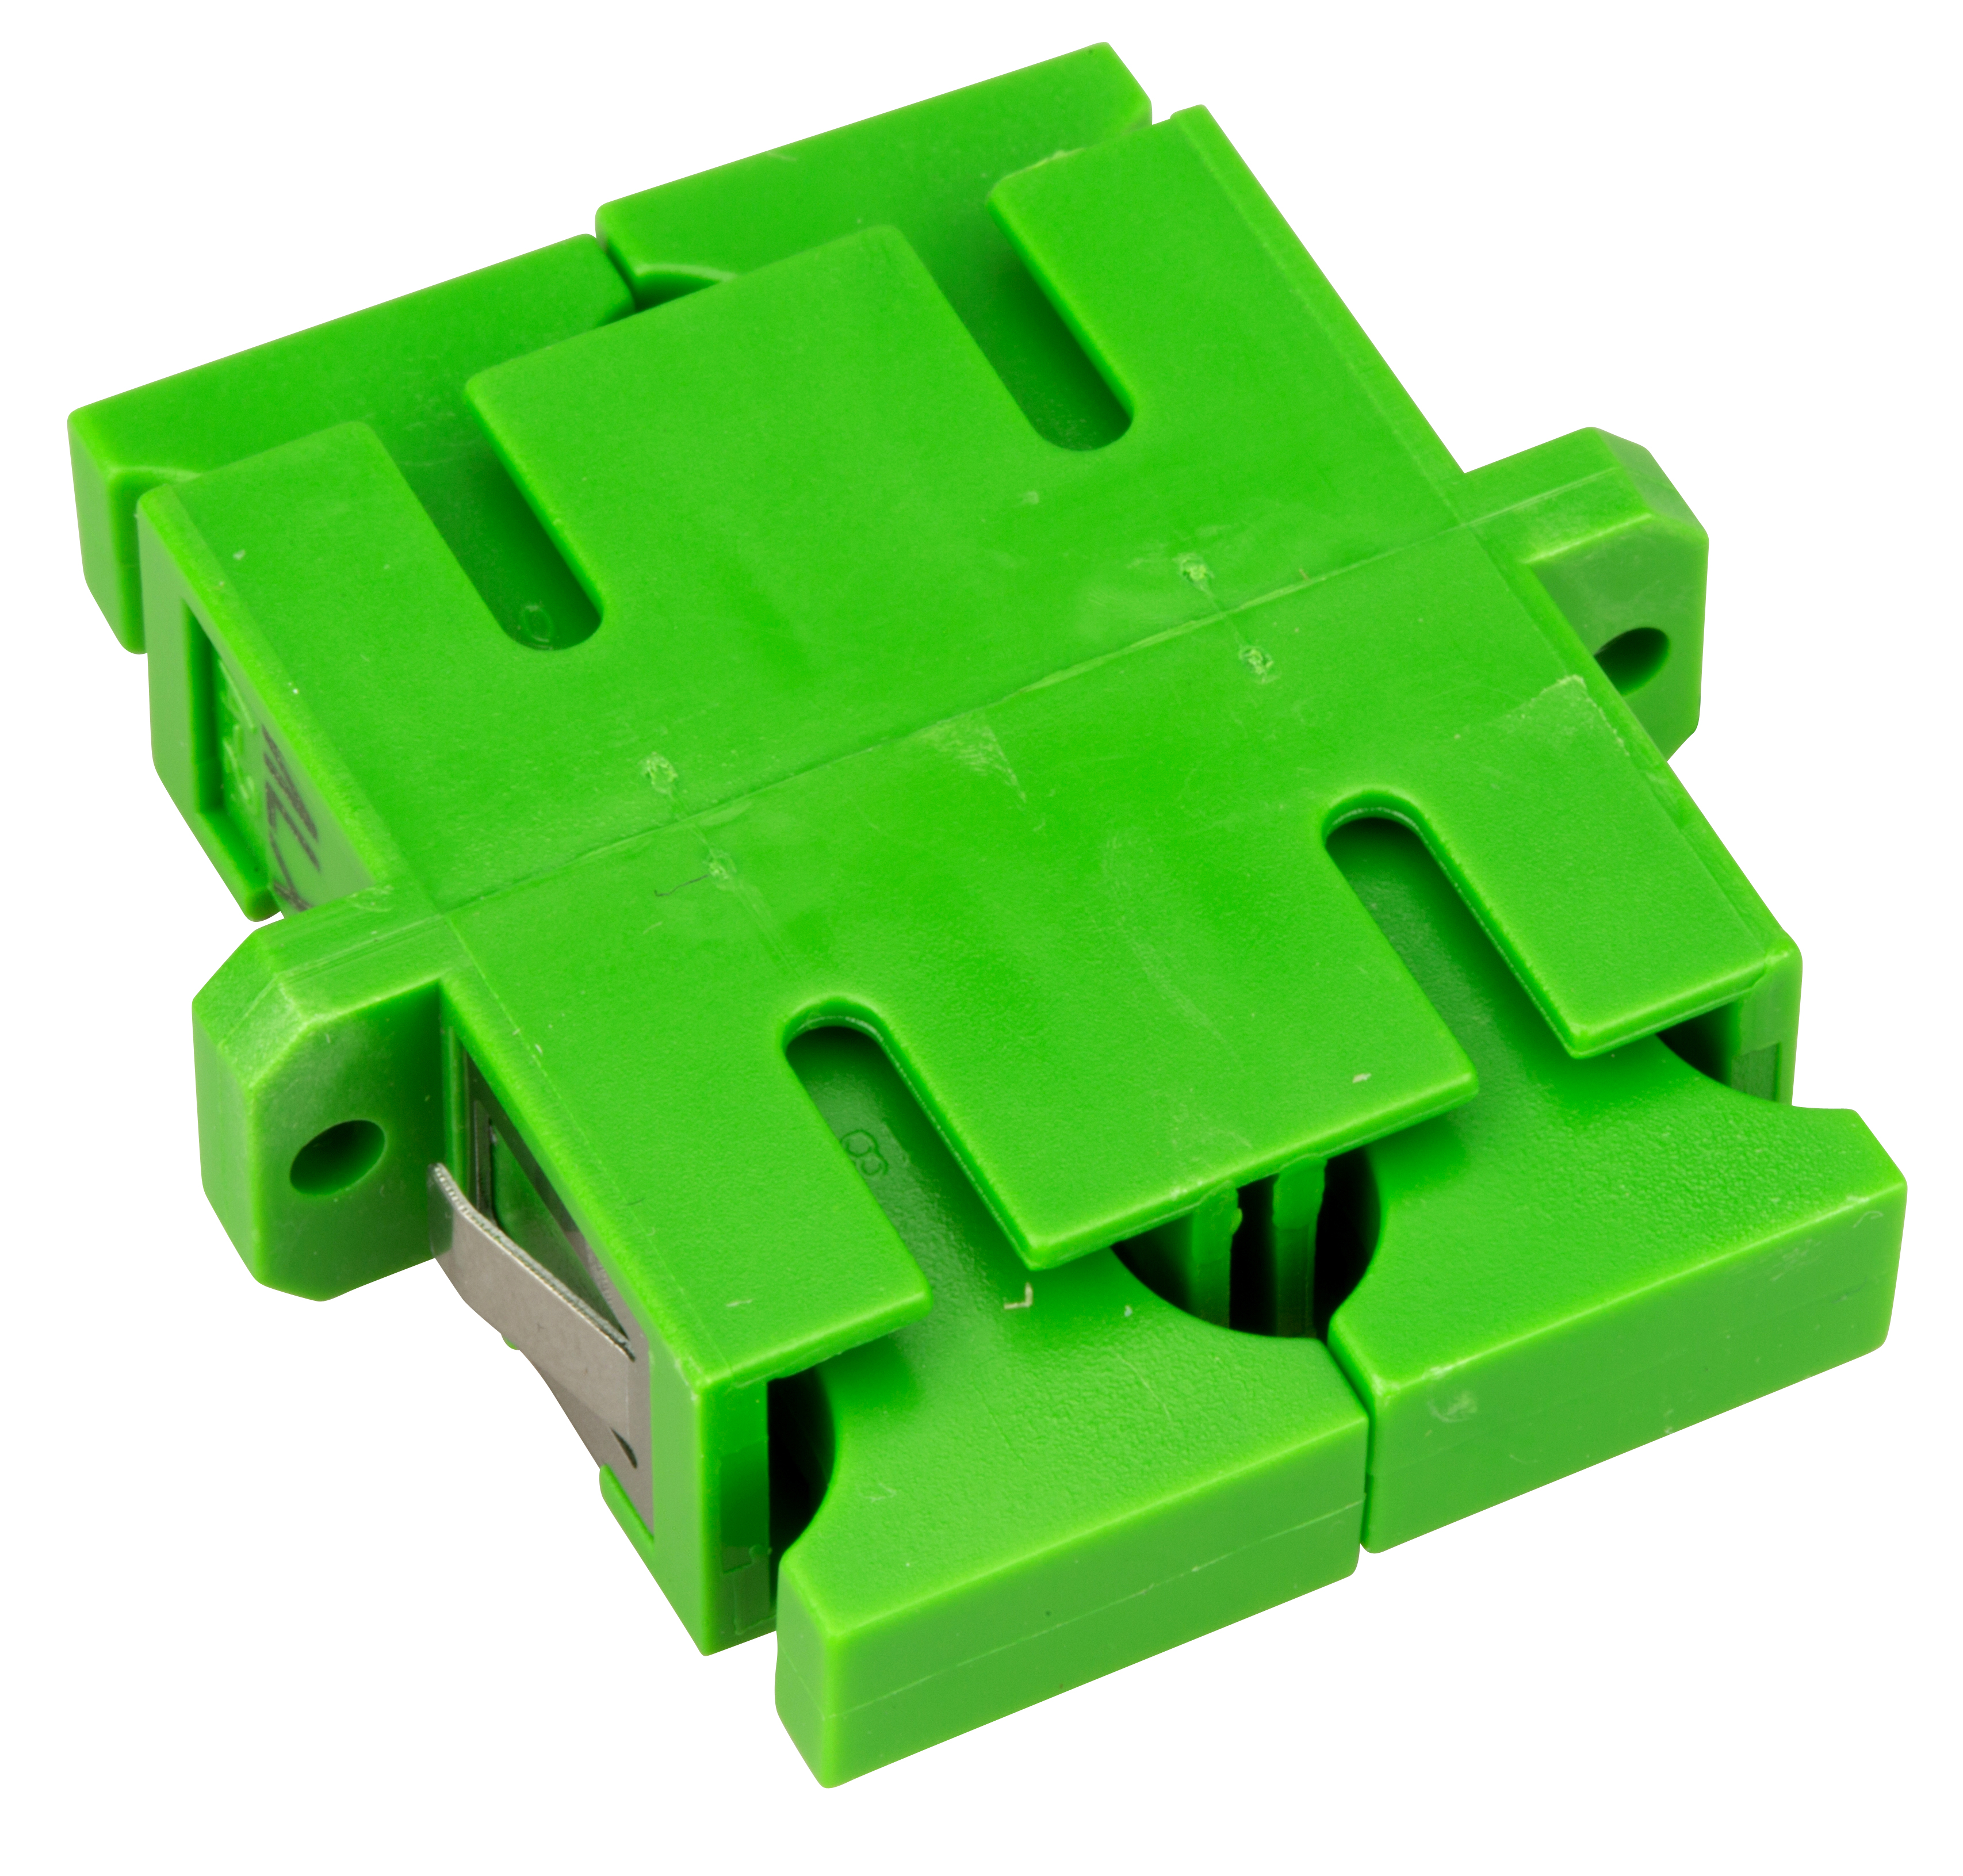 1 Stk LWL Kupplung SC/APC-DX, Singlemode,zirconia,Flansch,grün,ECO HMOLE00109